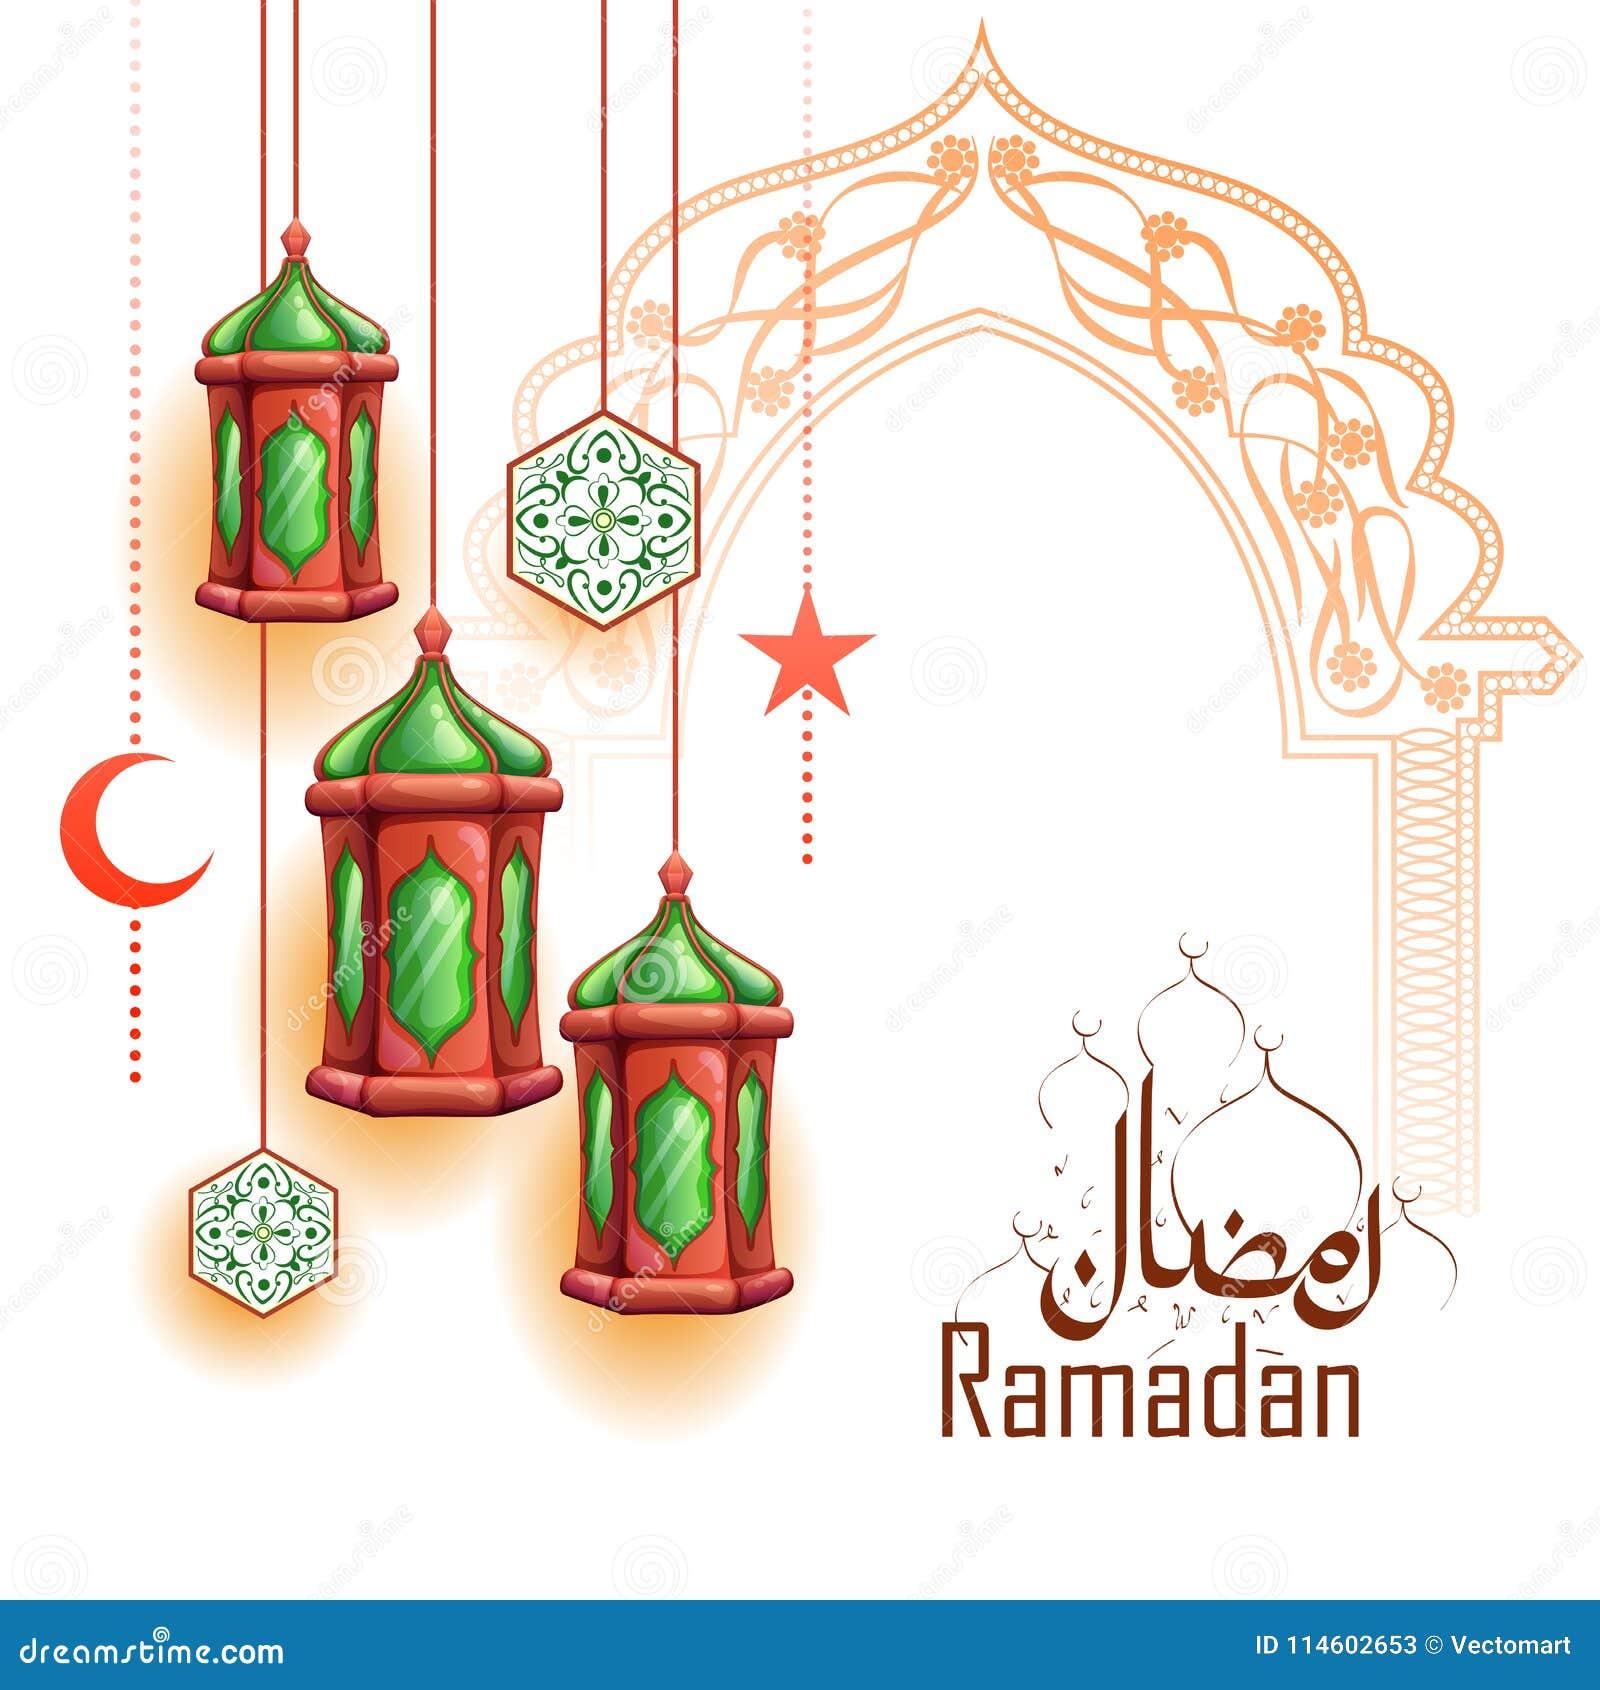 Ramadan kareem generous ramadan greetings for islam religious illustration of ramadan kareem generous ramadan greetings for islam religious festival eid with illuminated lamp m4hsunfo